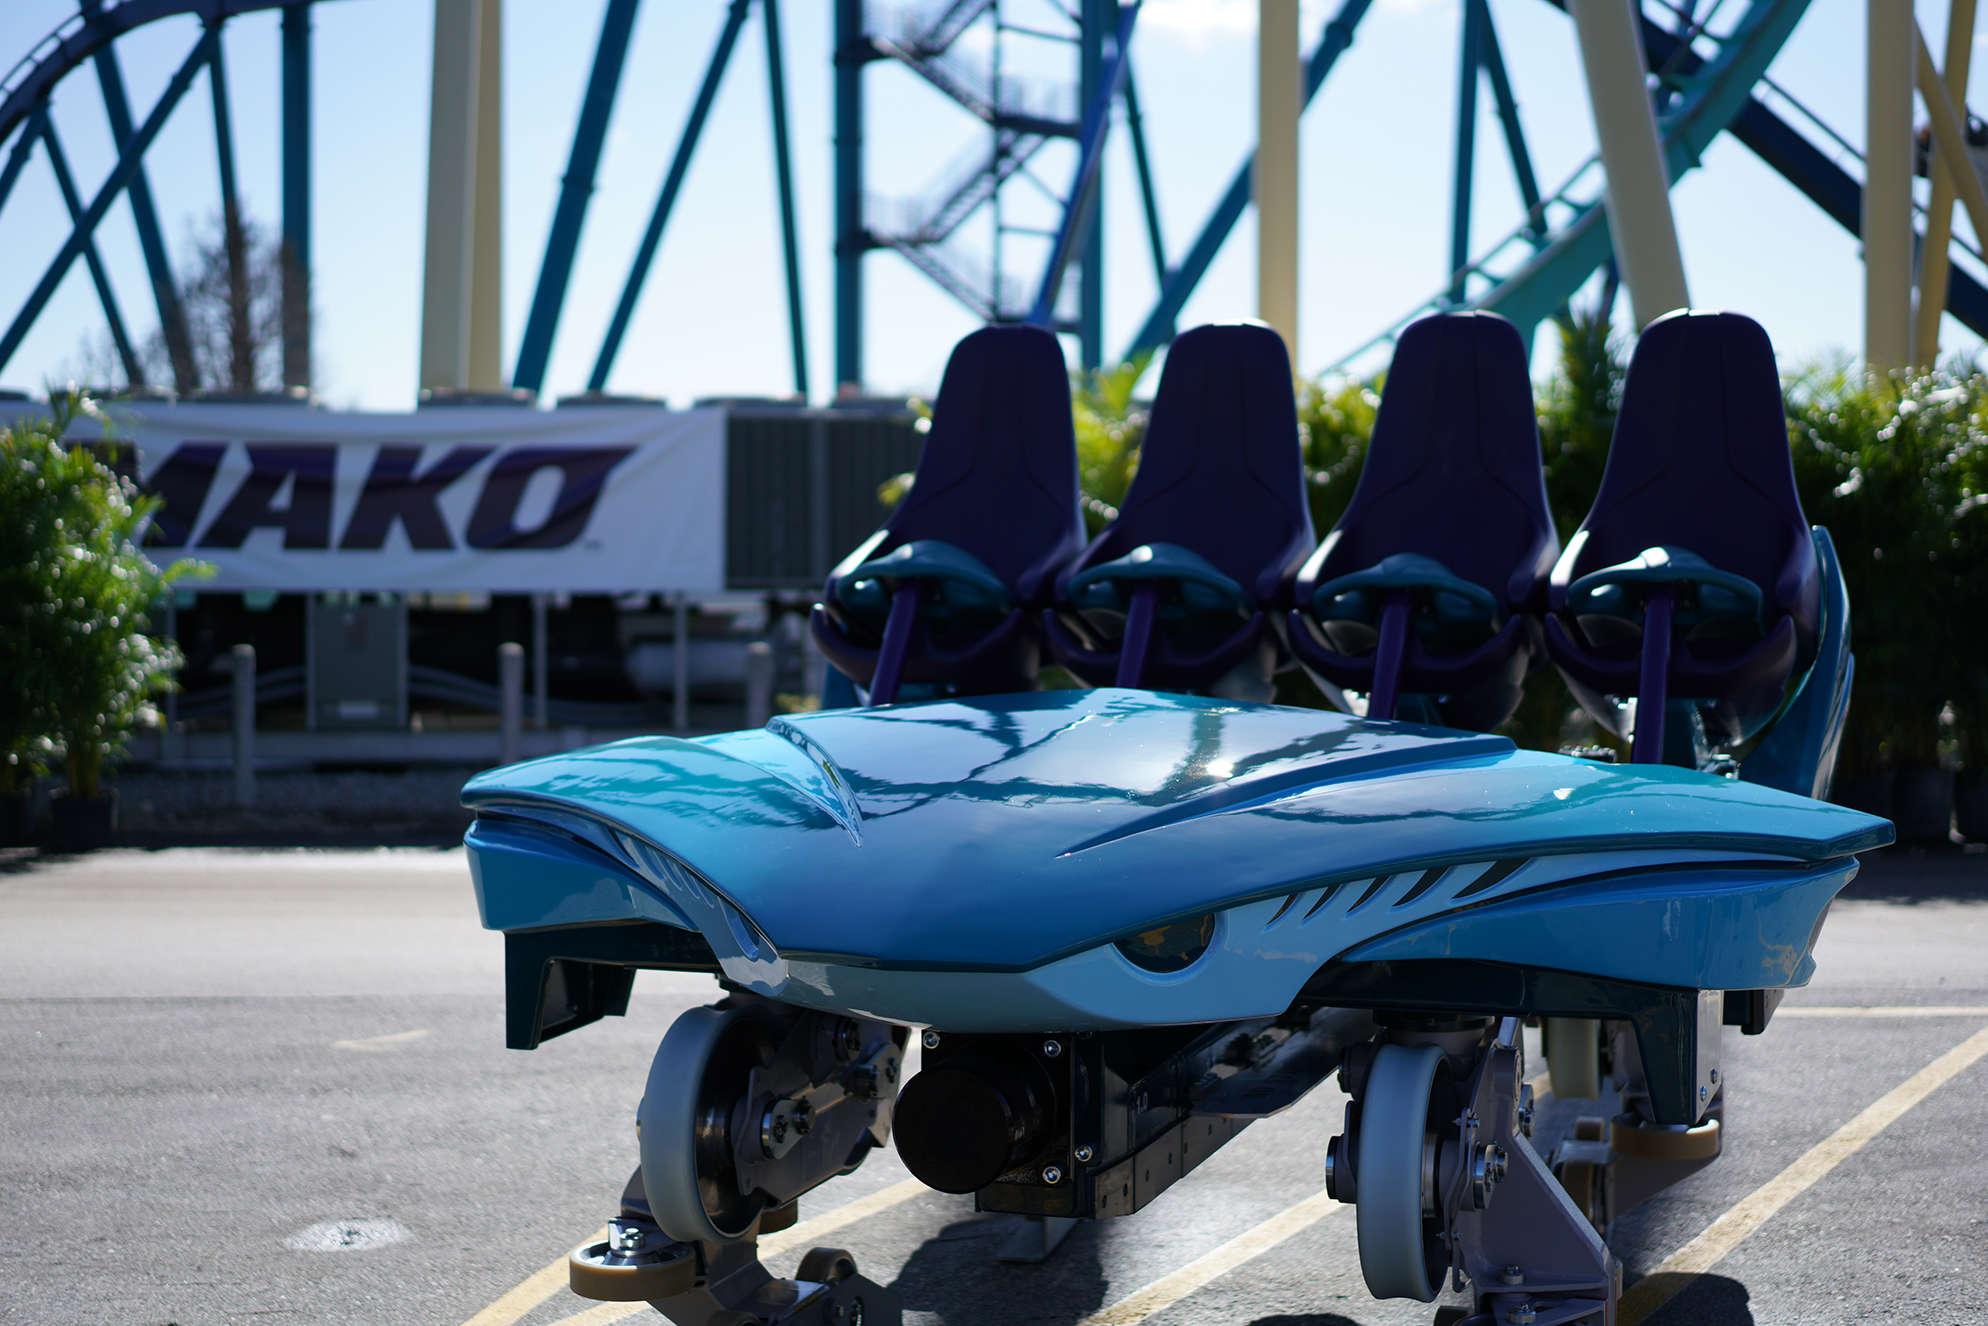 Mako ride vehicles unveiled at SeaWorld Orlando